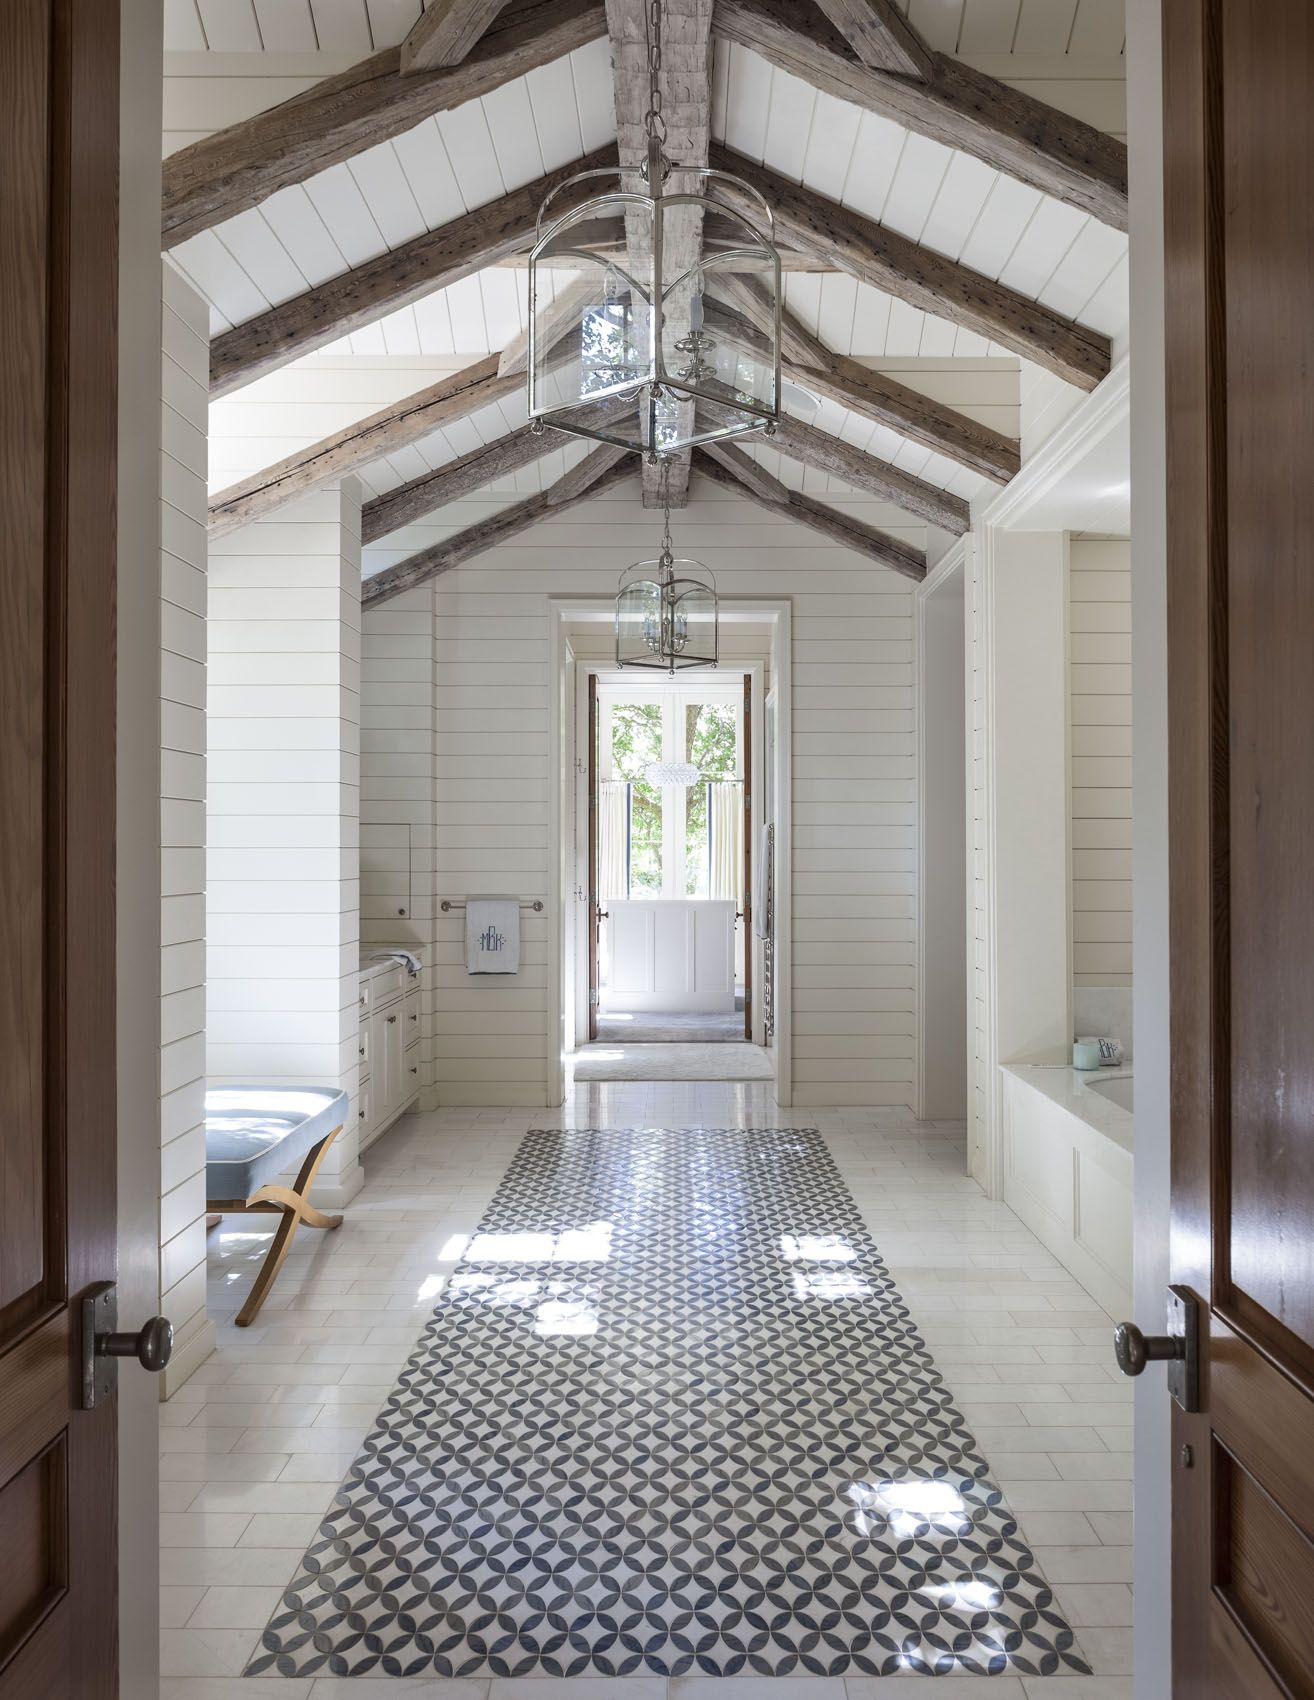 Vaulted Ceiling; Bathroom design | Inspiration | Bathrooms ...